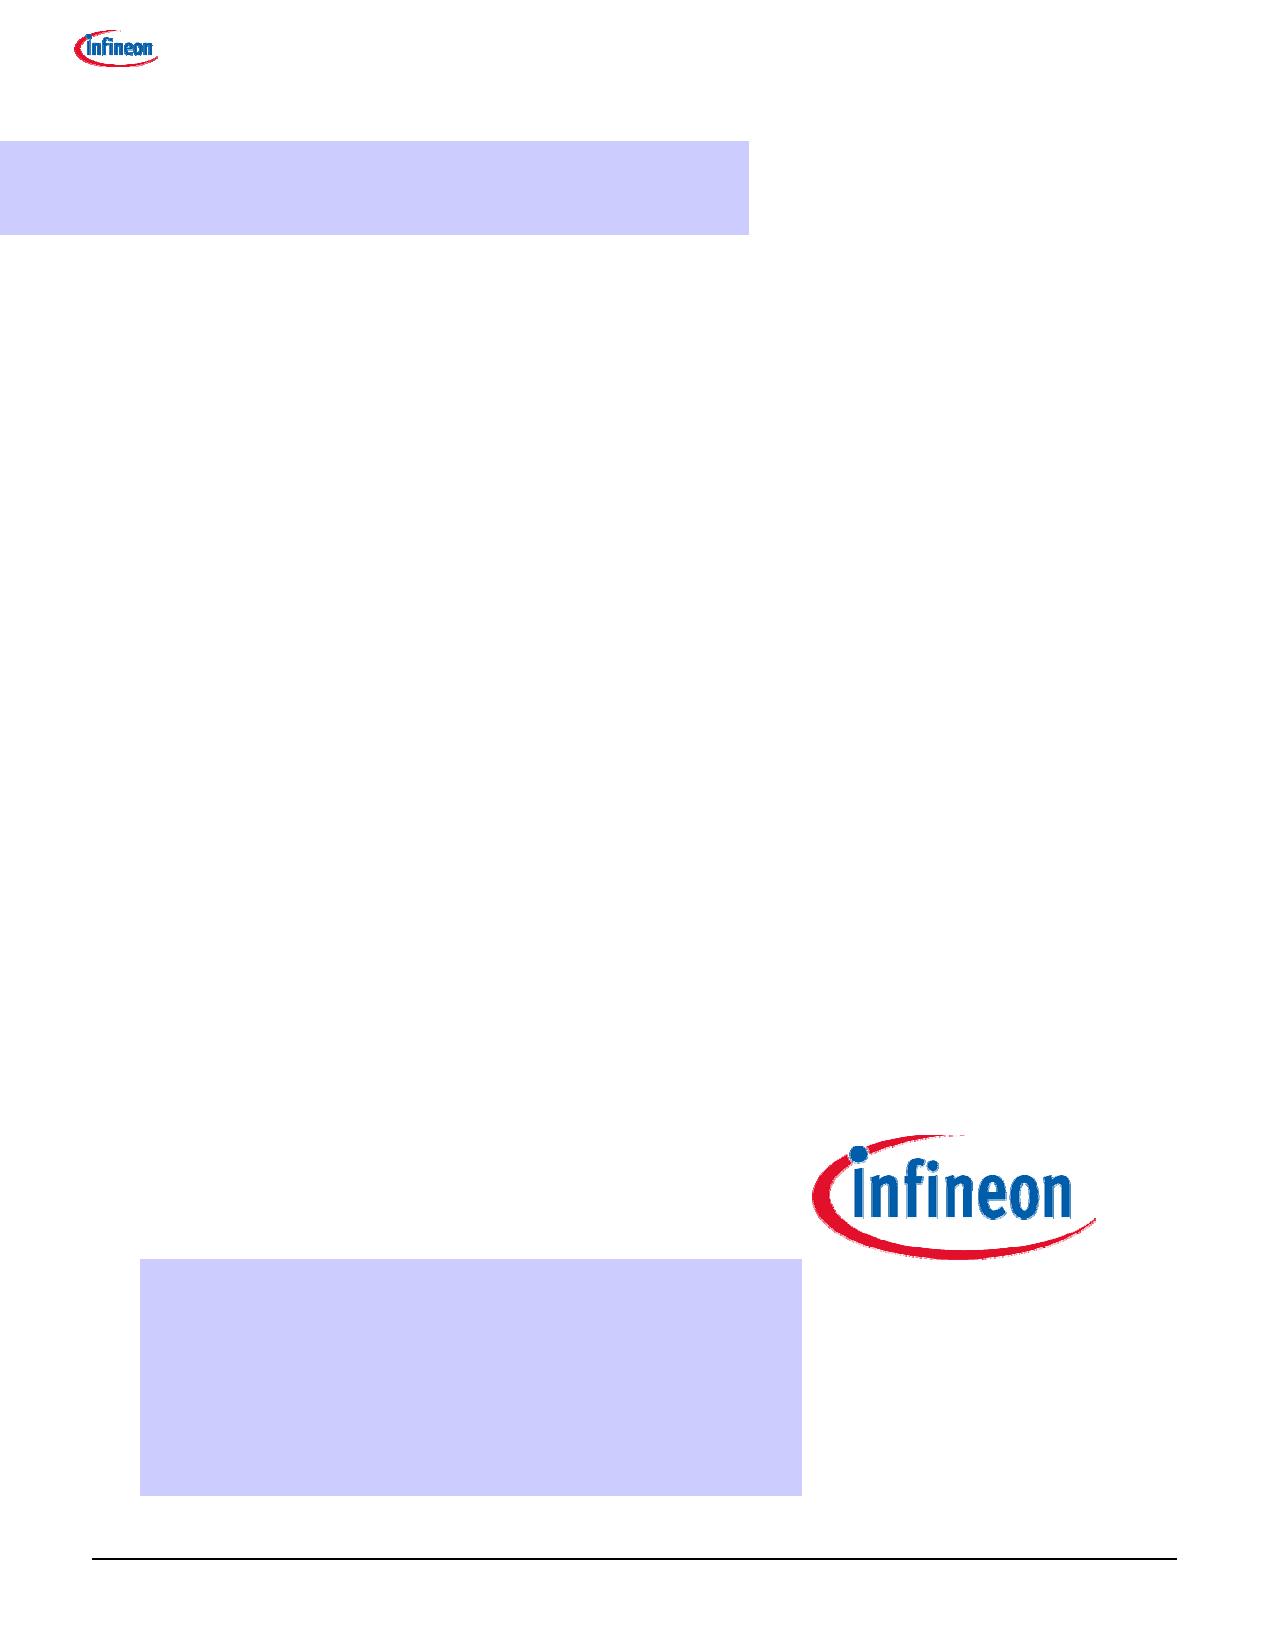 TDA21211 datasheet